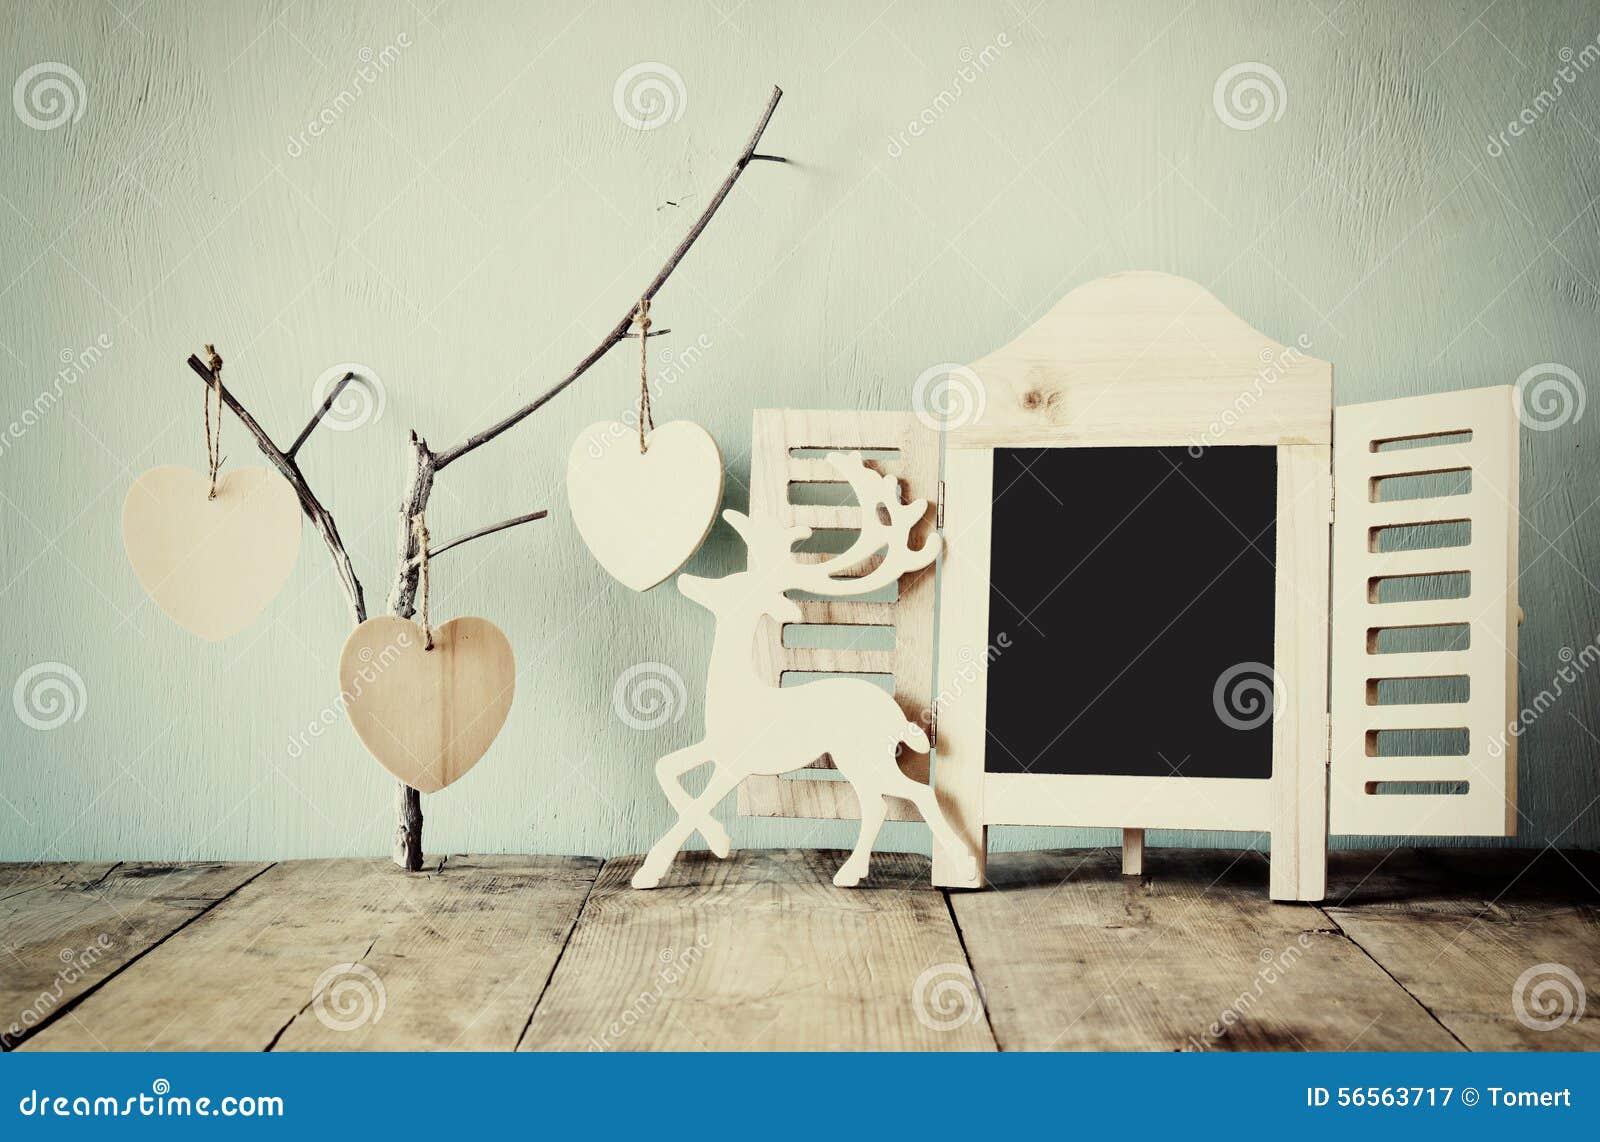 Download Διακοσμητικό πλαίσιο πινάκων κιμωλίας και ξύλινες κρεμώντας καρδιές πέρα από τον ξύλινο πίνακα έτοιμος για το κείμενο ή το πρότυπ Στοκ Εικόνα - εικόνα από κενός, καρδιά: 56563717